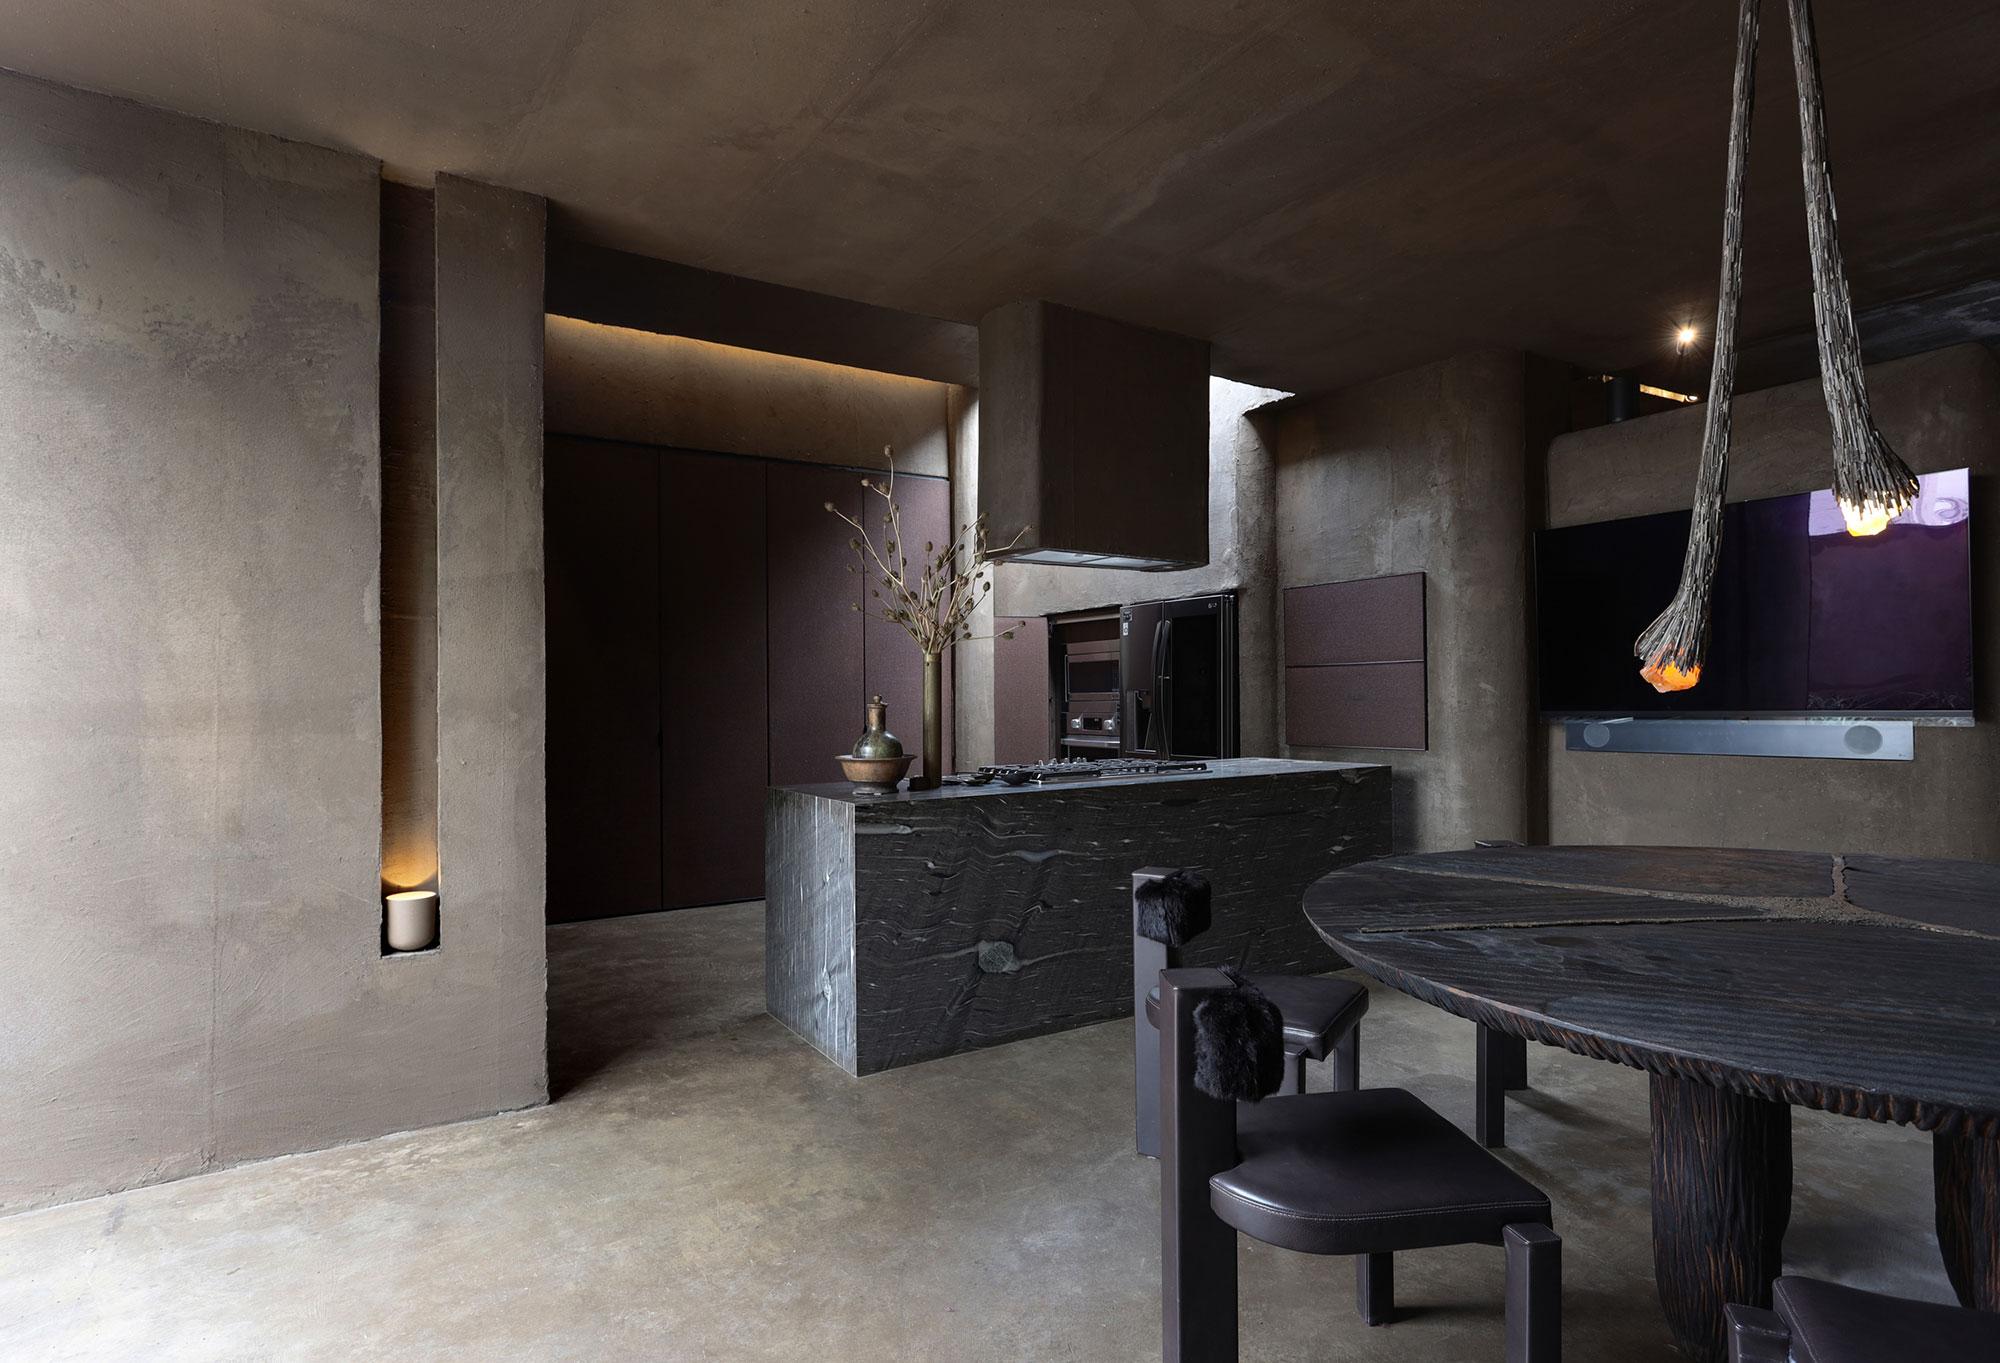 casa sume gustavo neves cozinha minimalista rustica casacor sao paulo 2019